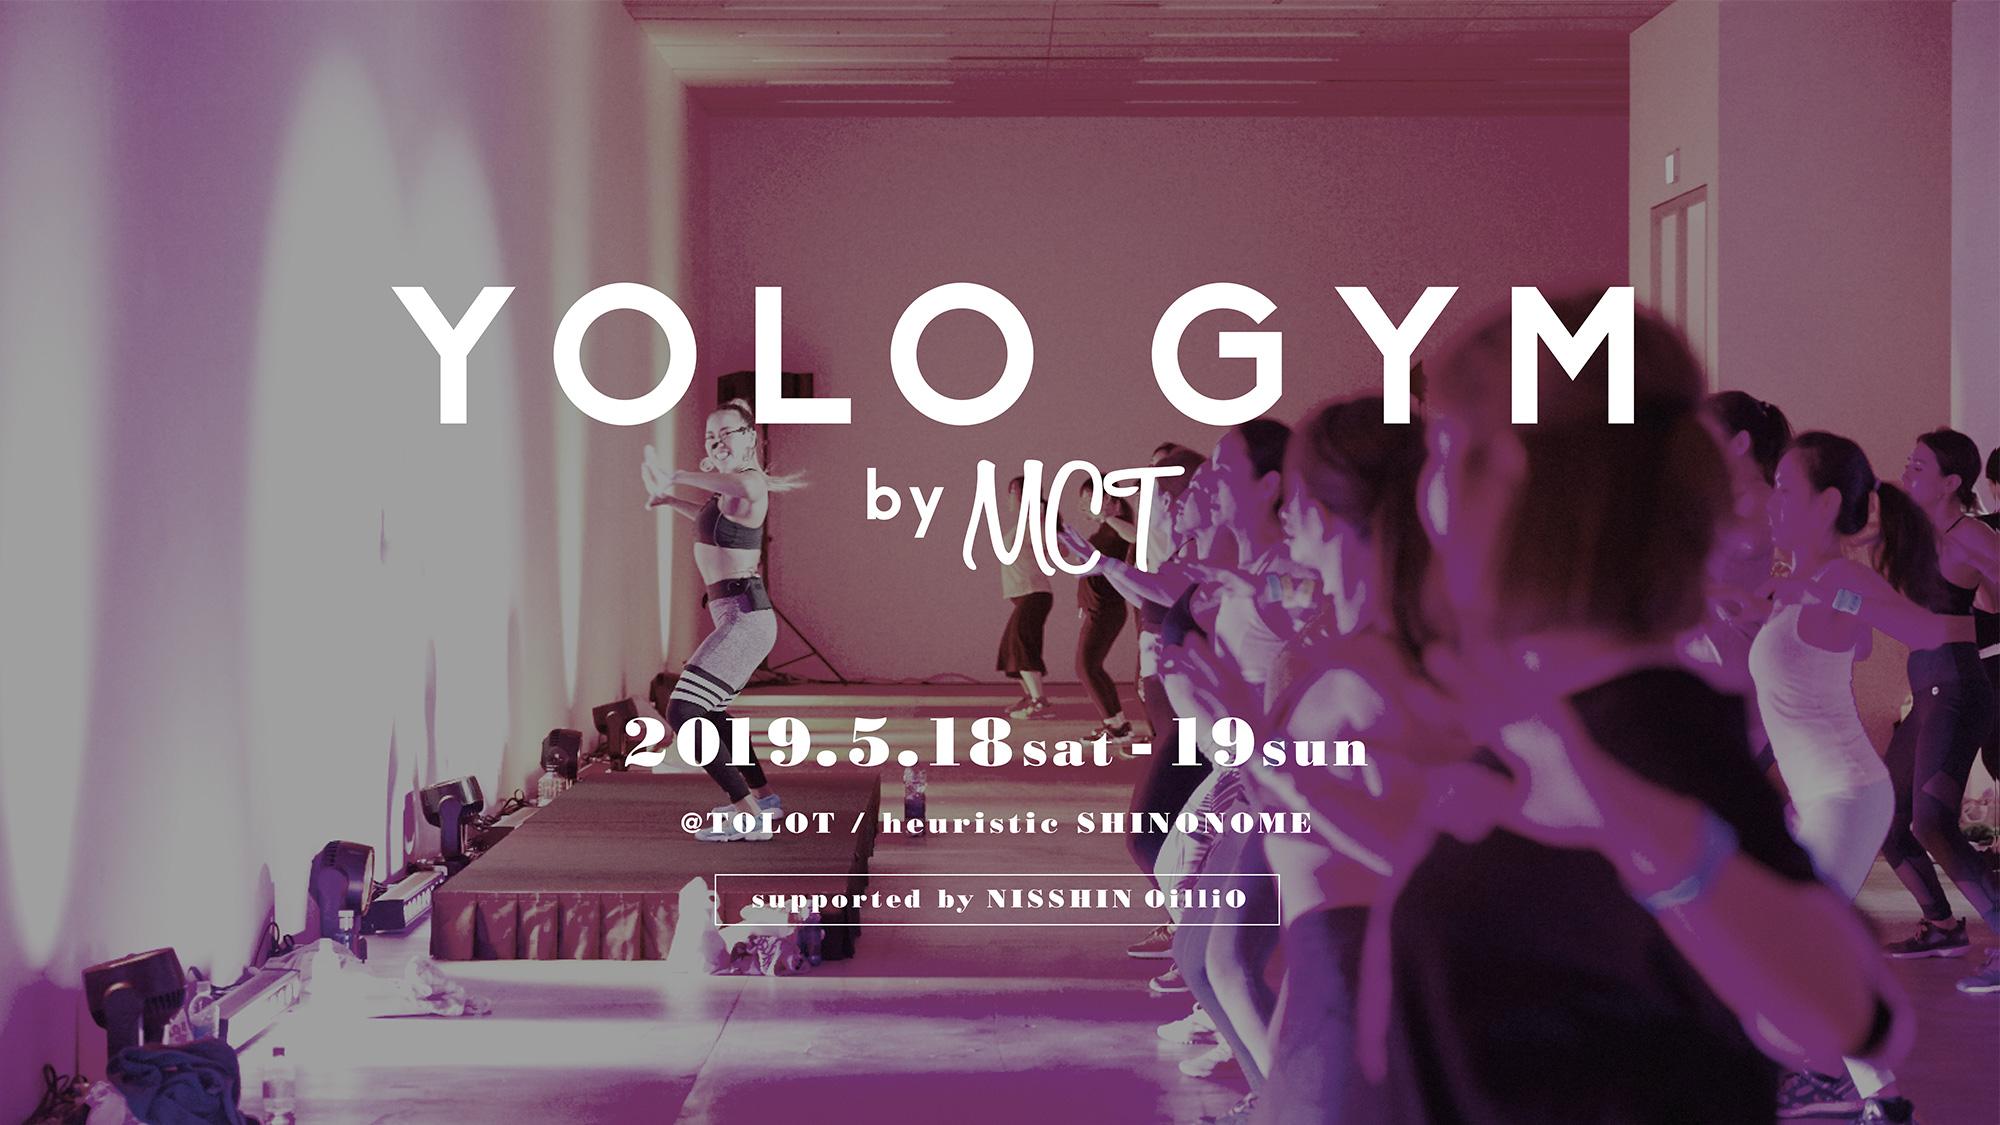 YOLO GYM by MCT 2019.5.18sat-19sun. @TOLOT SHINONOME STUDIO